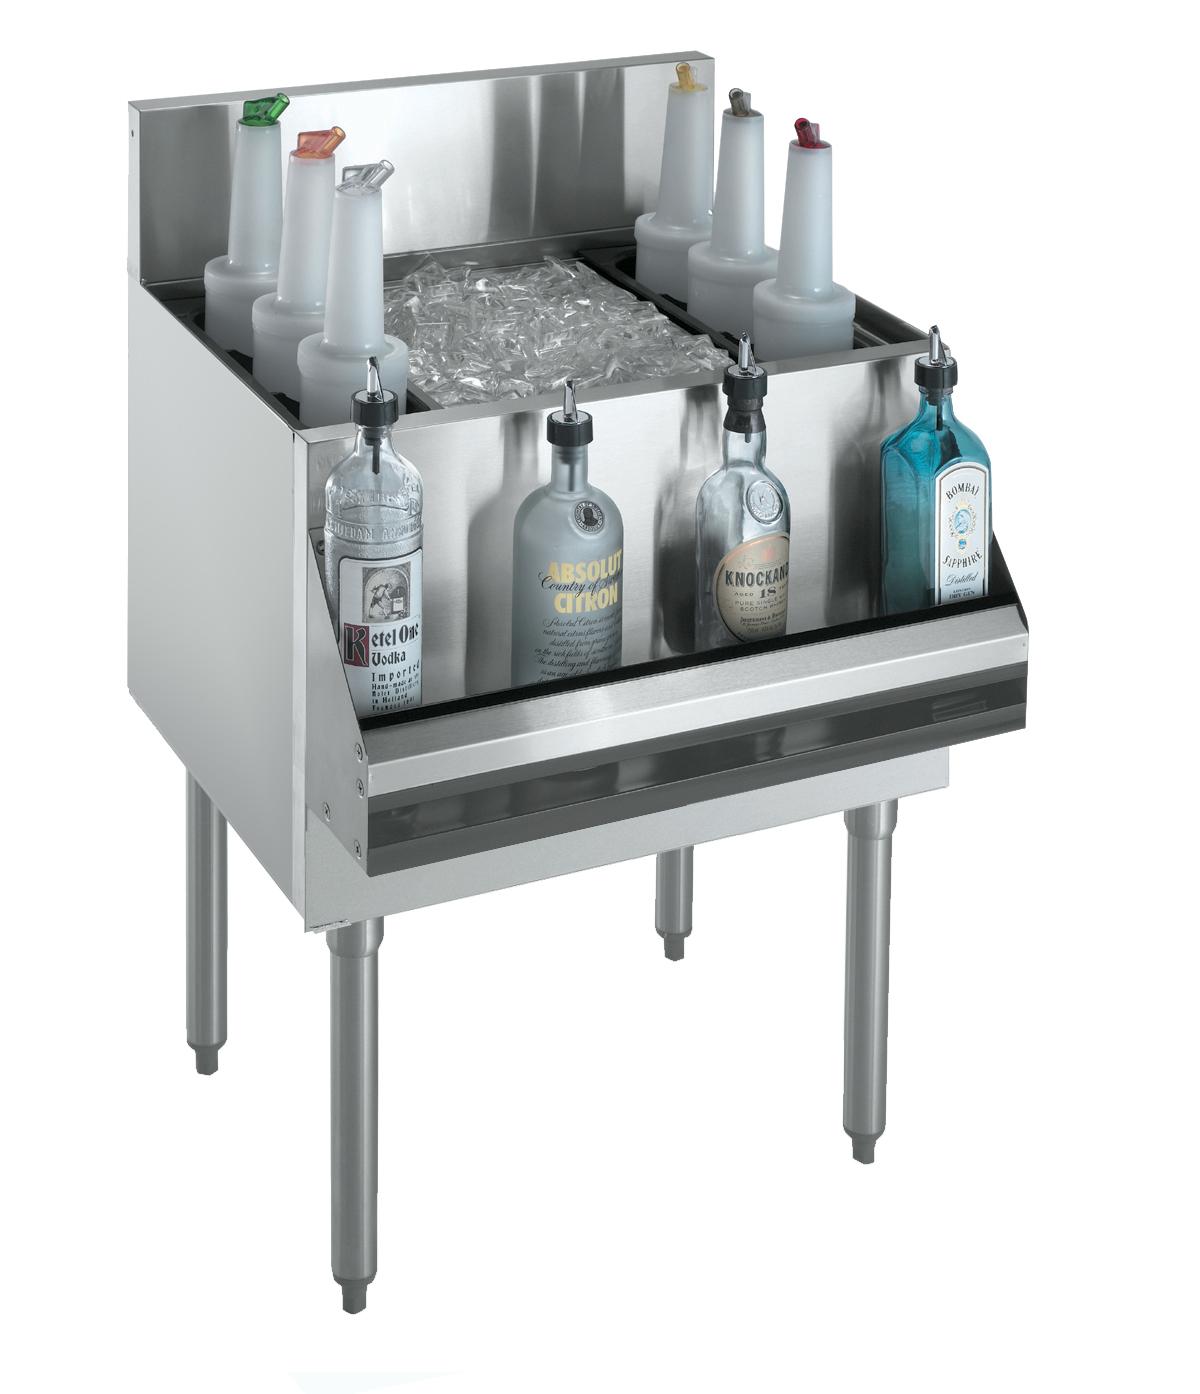 Krowne Metal KR18-24DP-10 underbar ice bin/cocktail unit